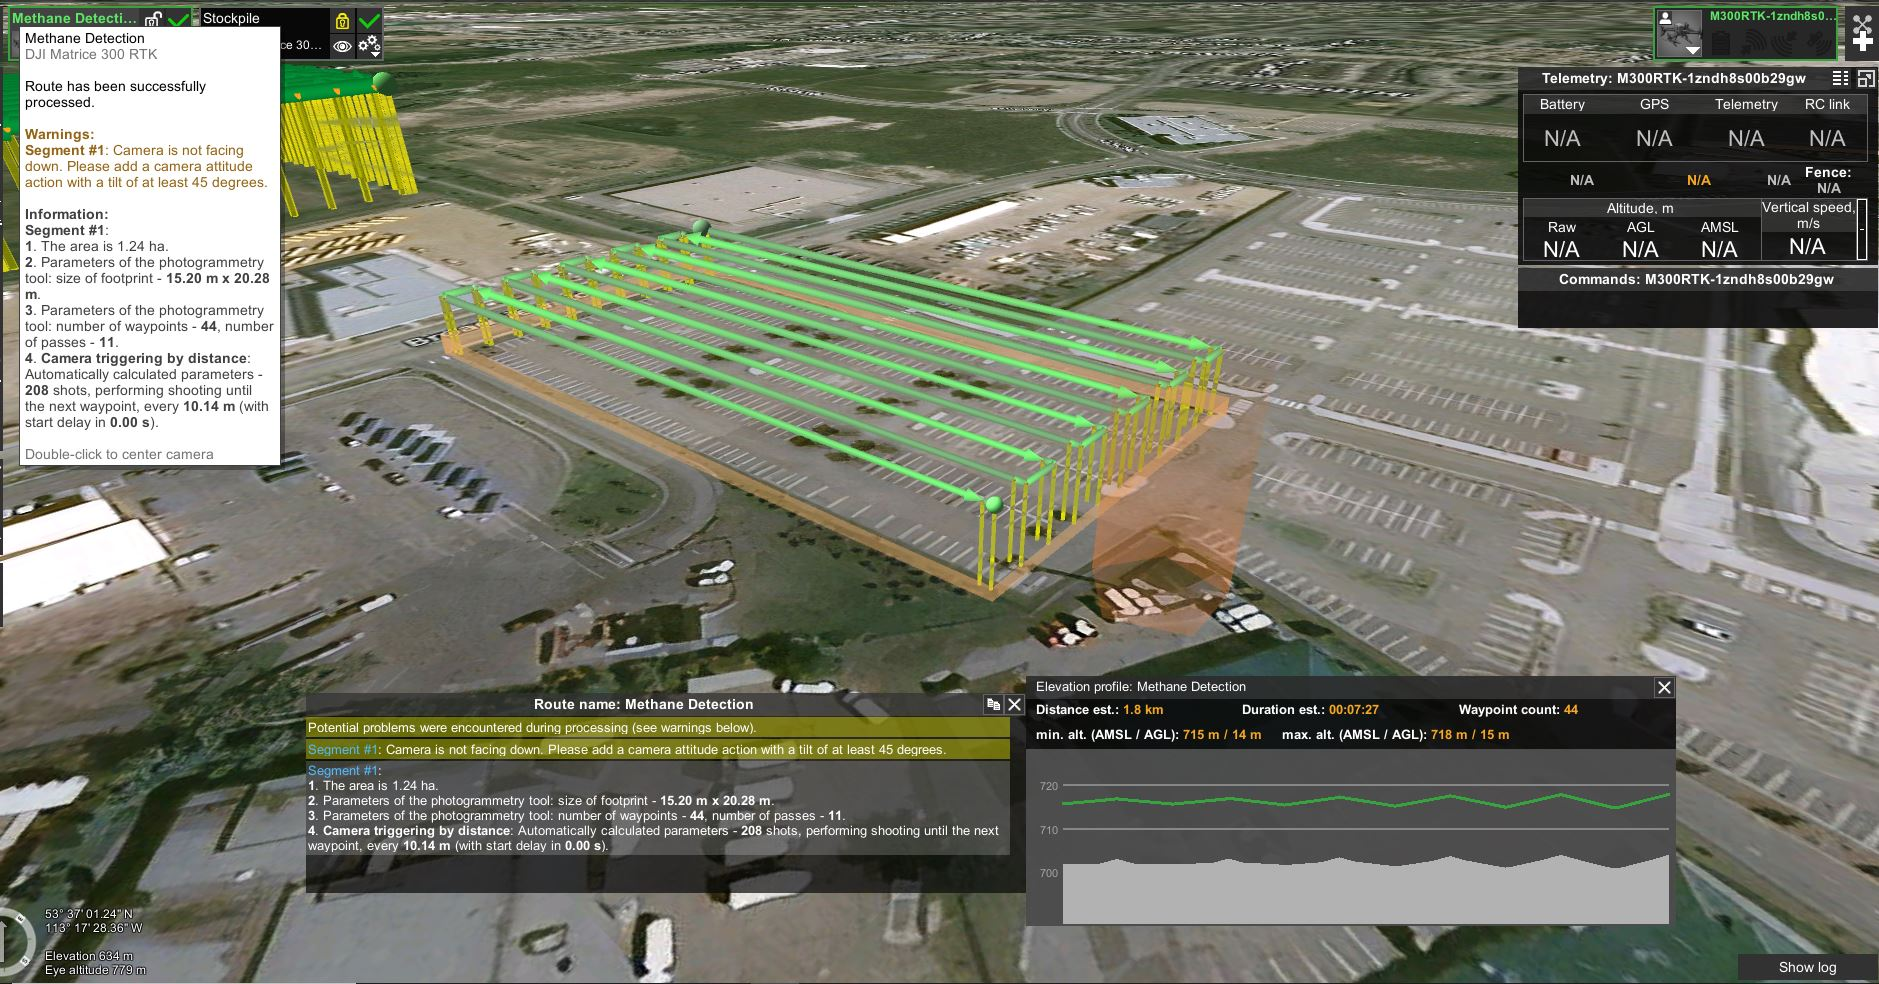 Methane Leak Detection Flight Plan